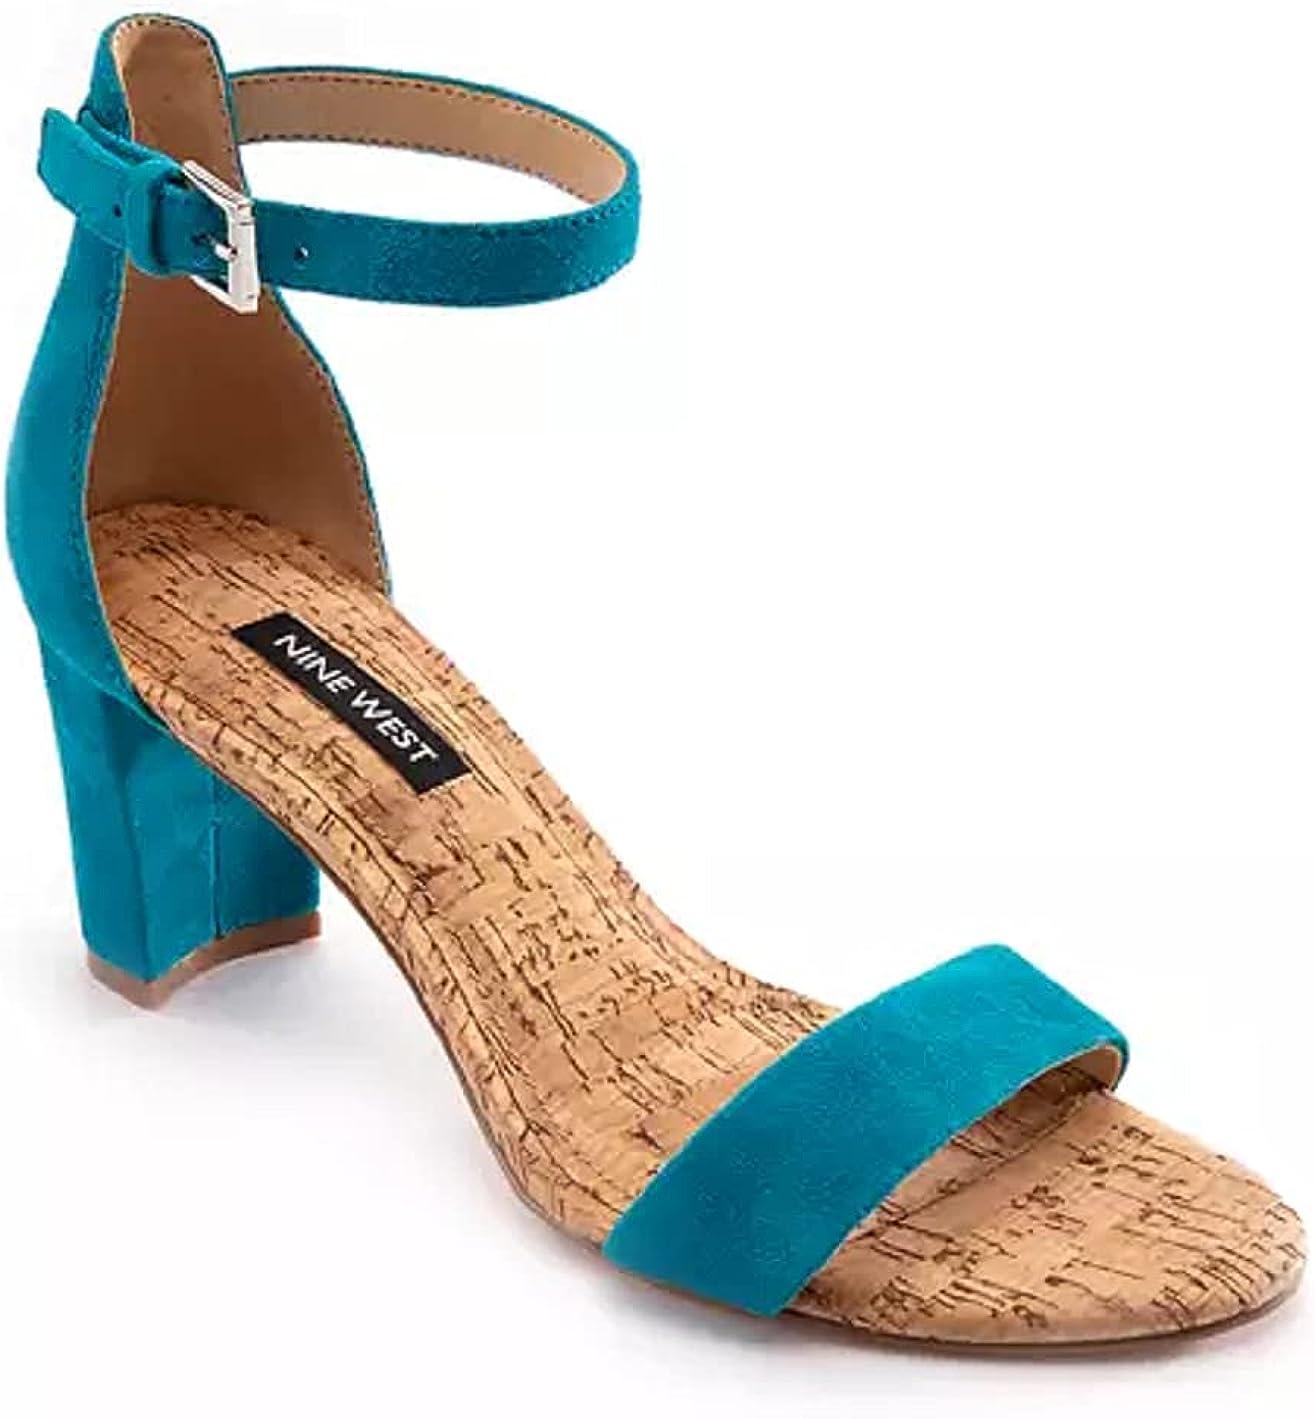 Nine West Pruce Ankle Strap Sandals